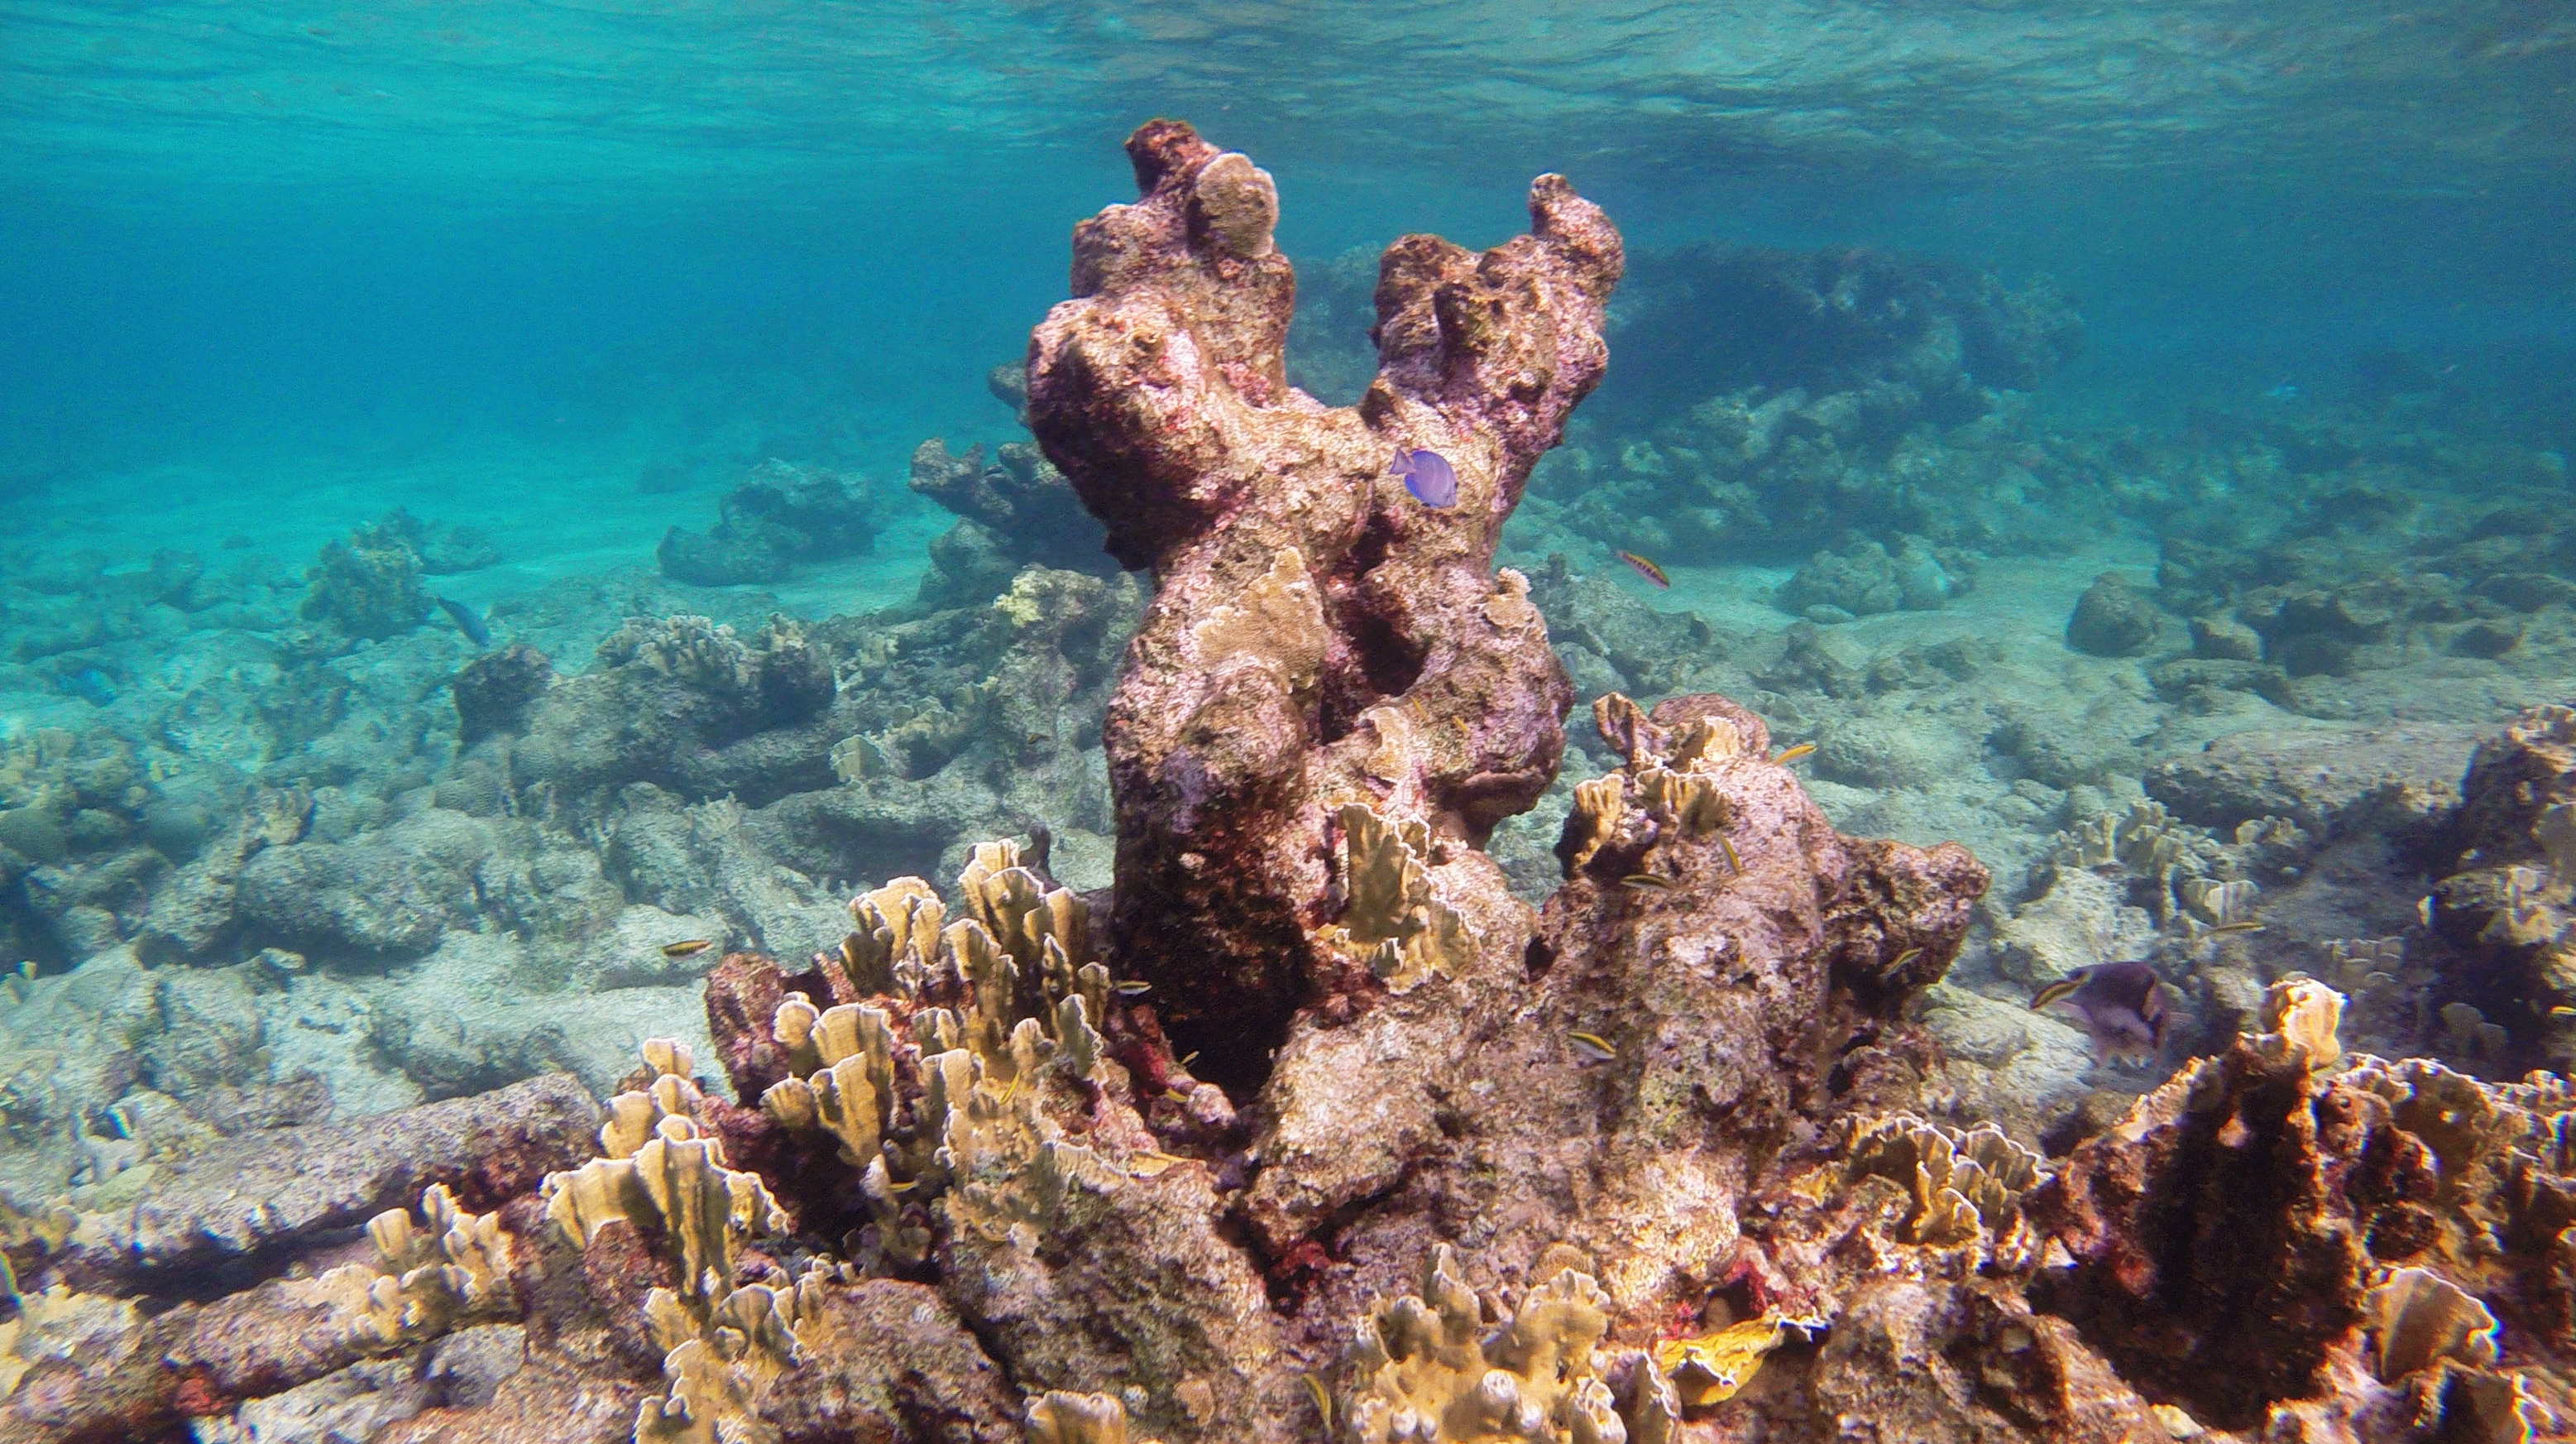 File:Snorkeling Karpata Reef, Bonaire (12842383794).jpg - Wikimedia ...